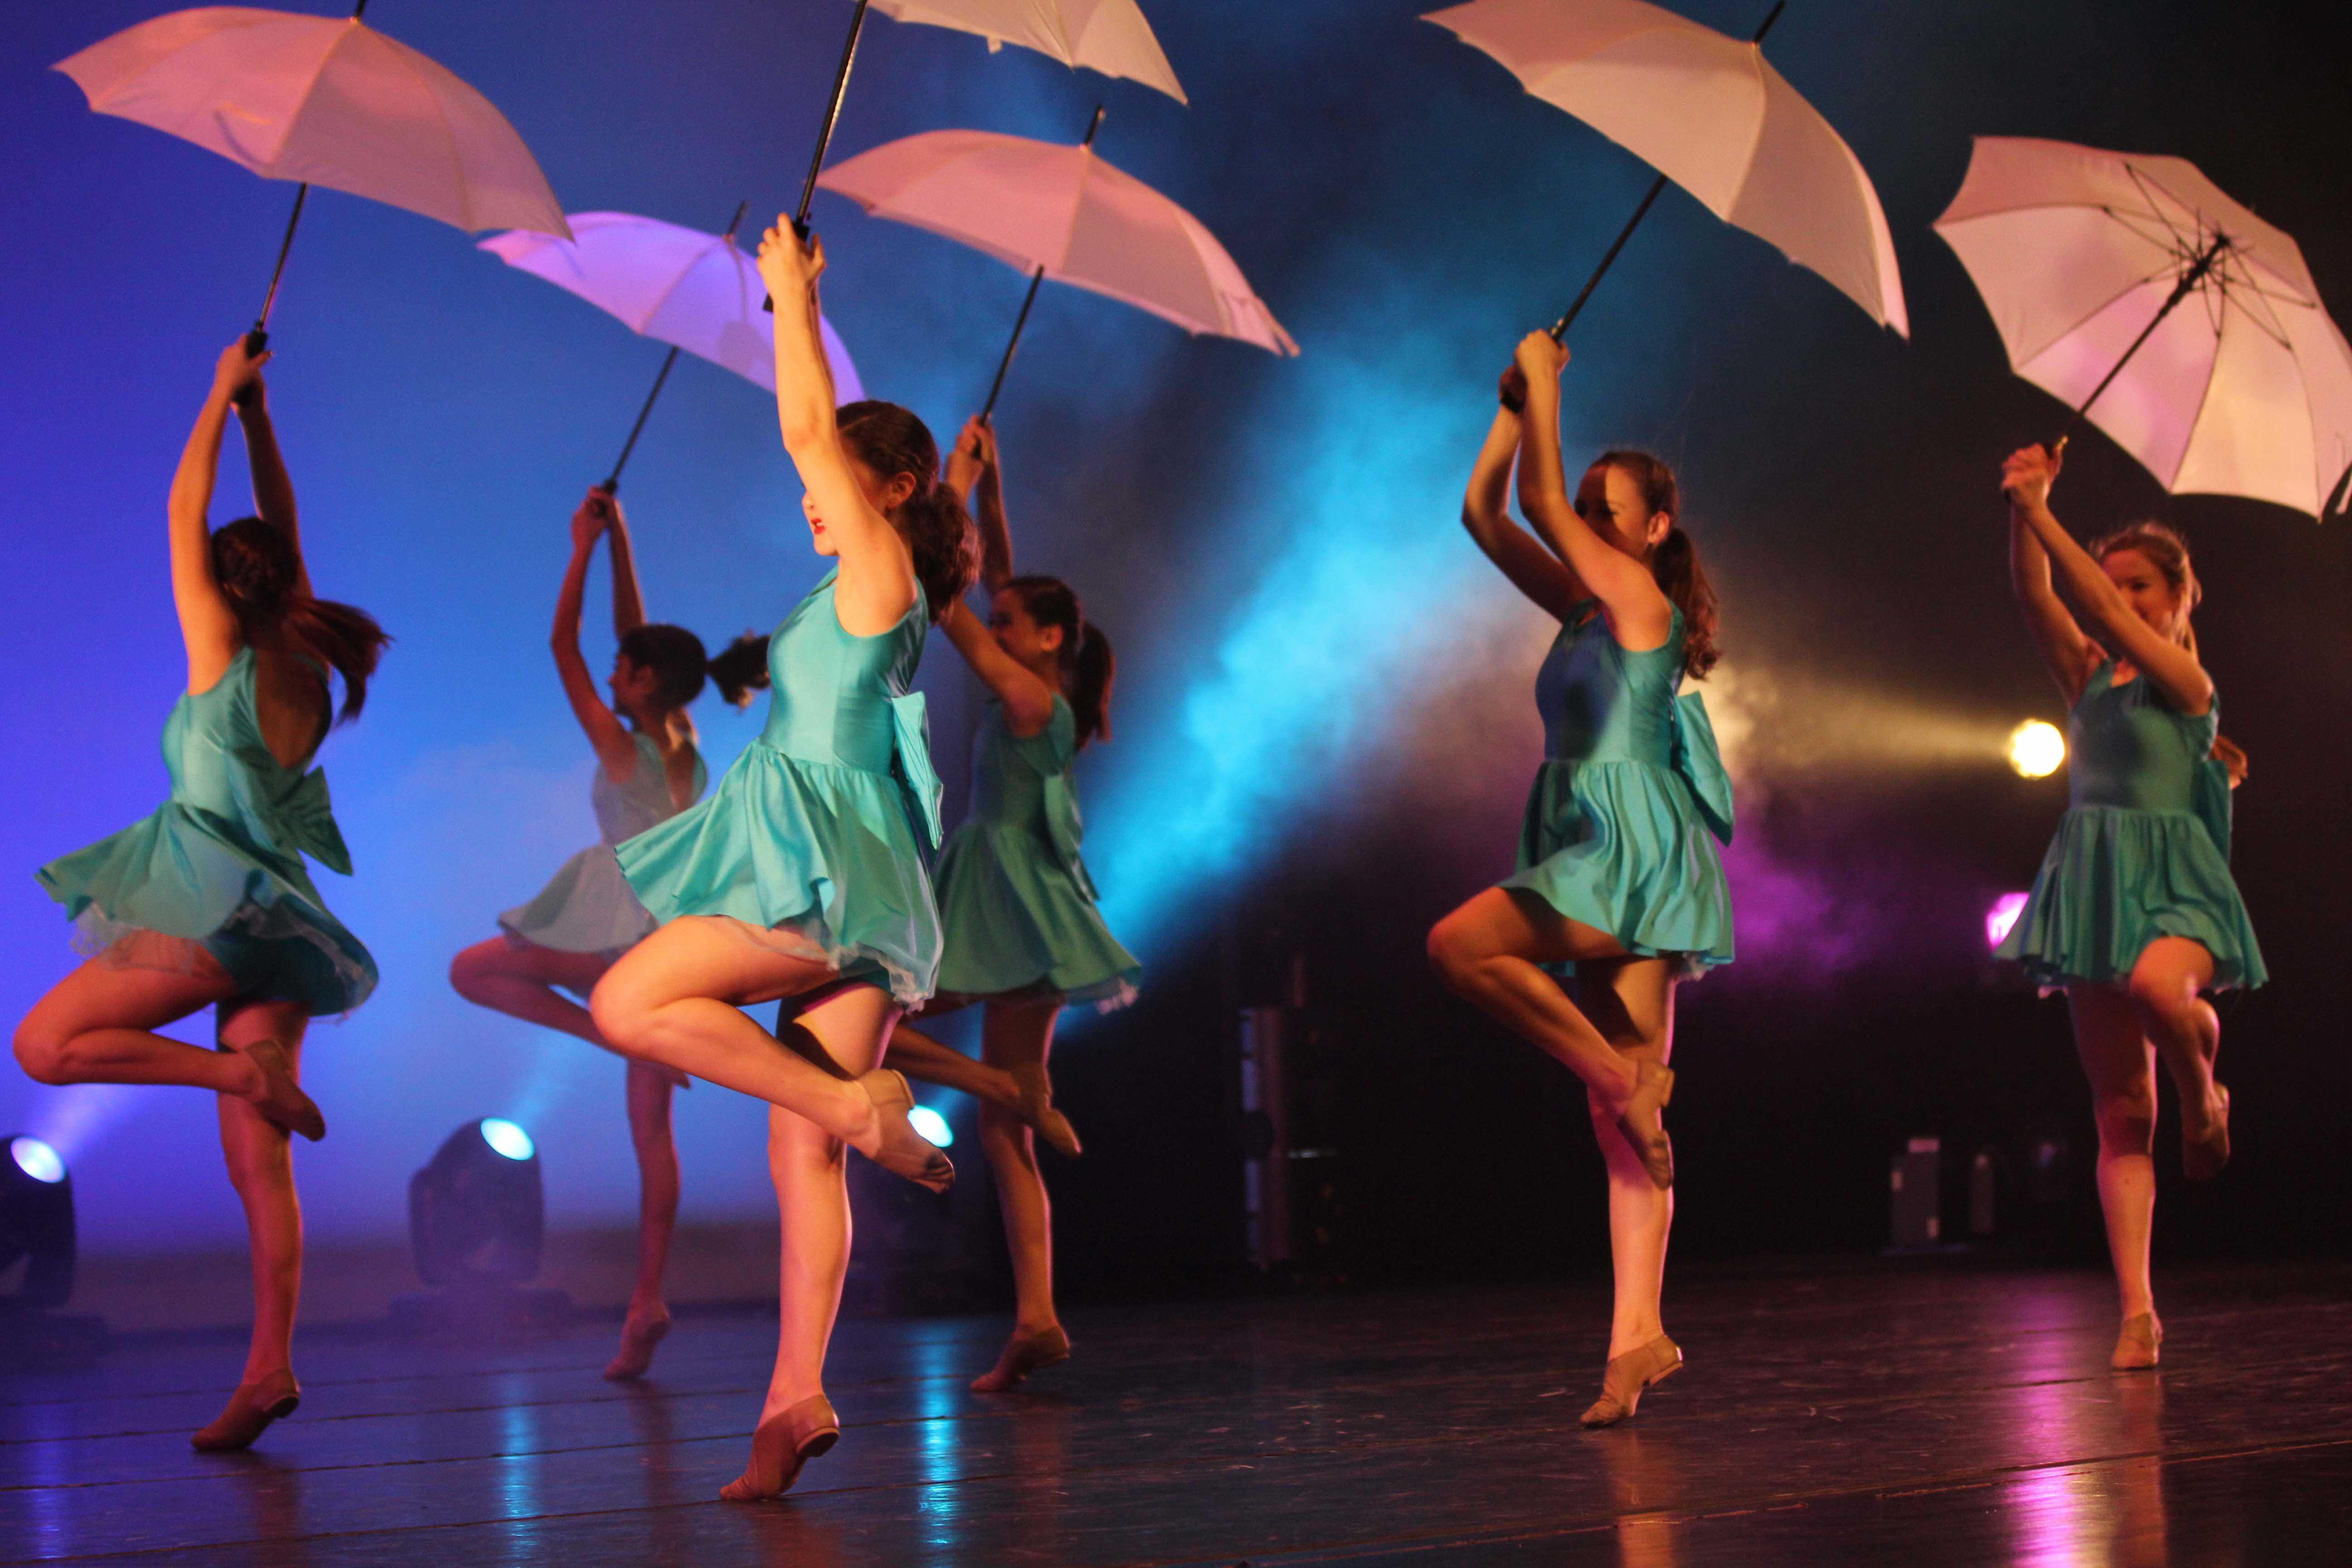 SunDancer+Babies+dance+to+%22Don%27t+Rain+On+My+Parade%22.